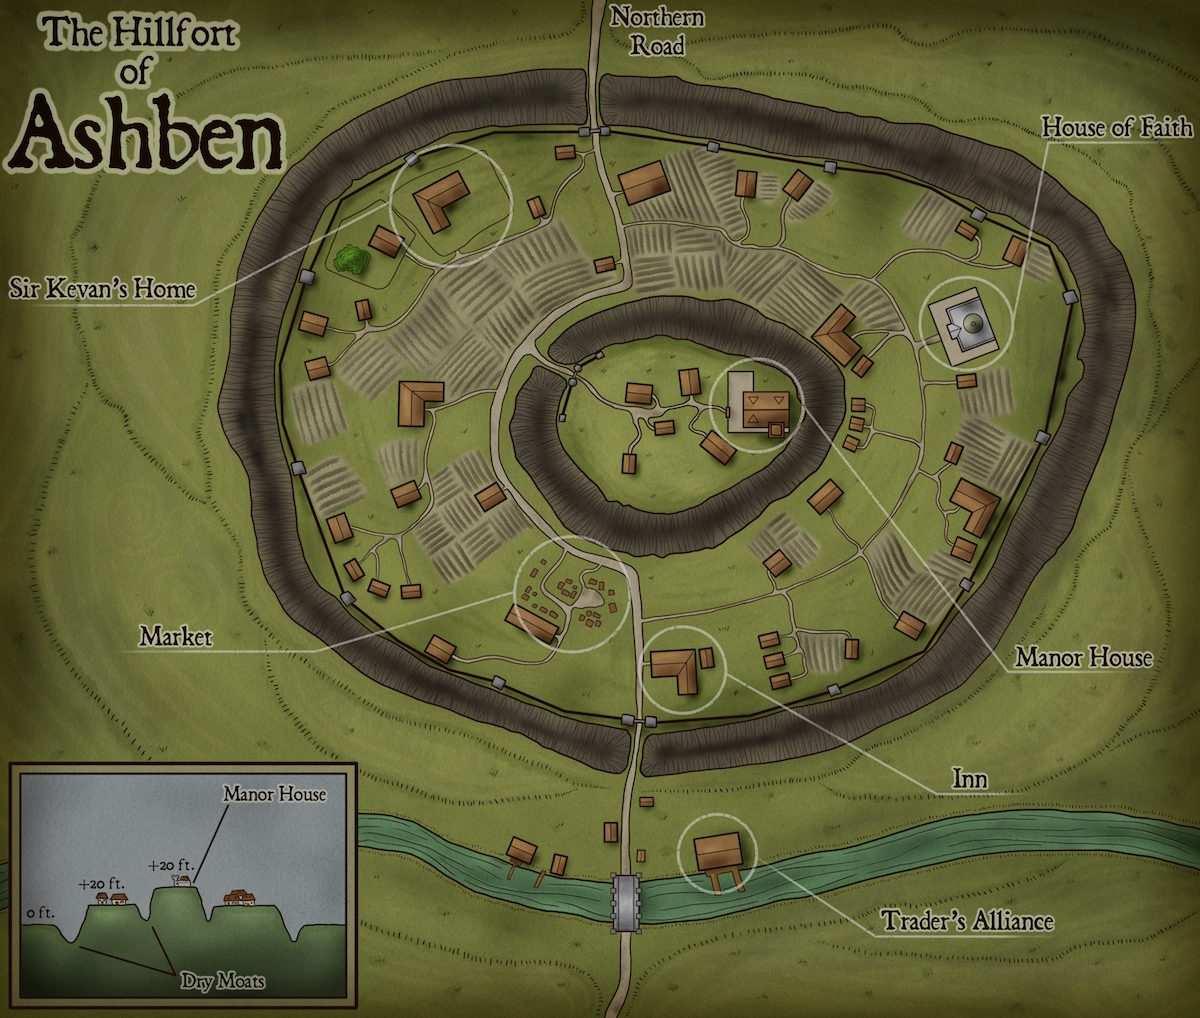 127 – The Hillfort of Ashben